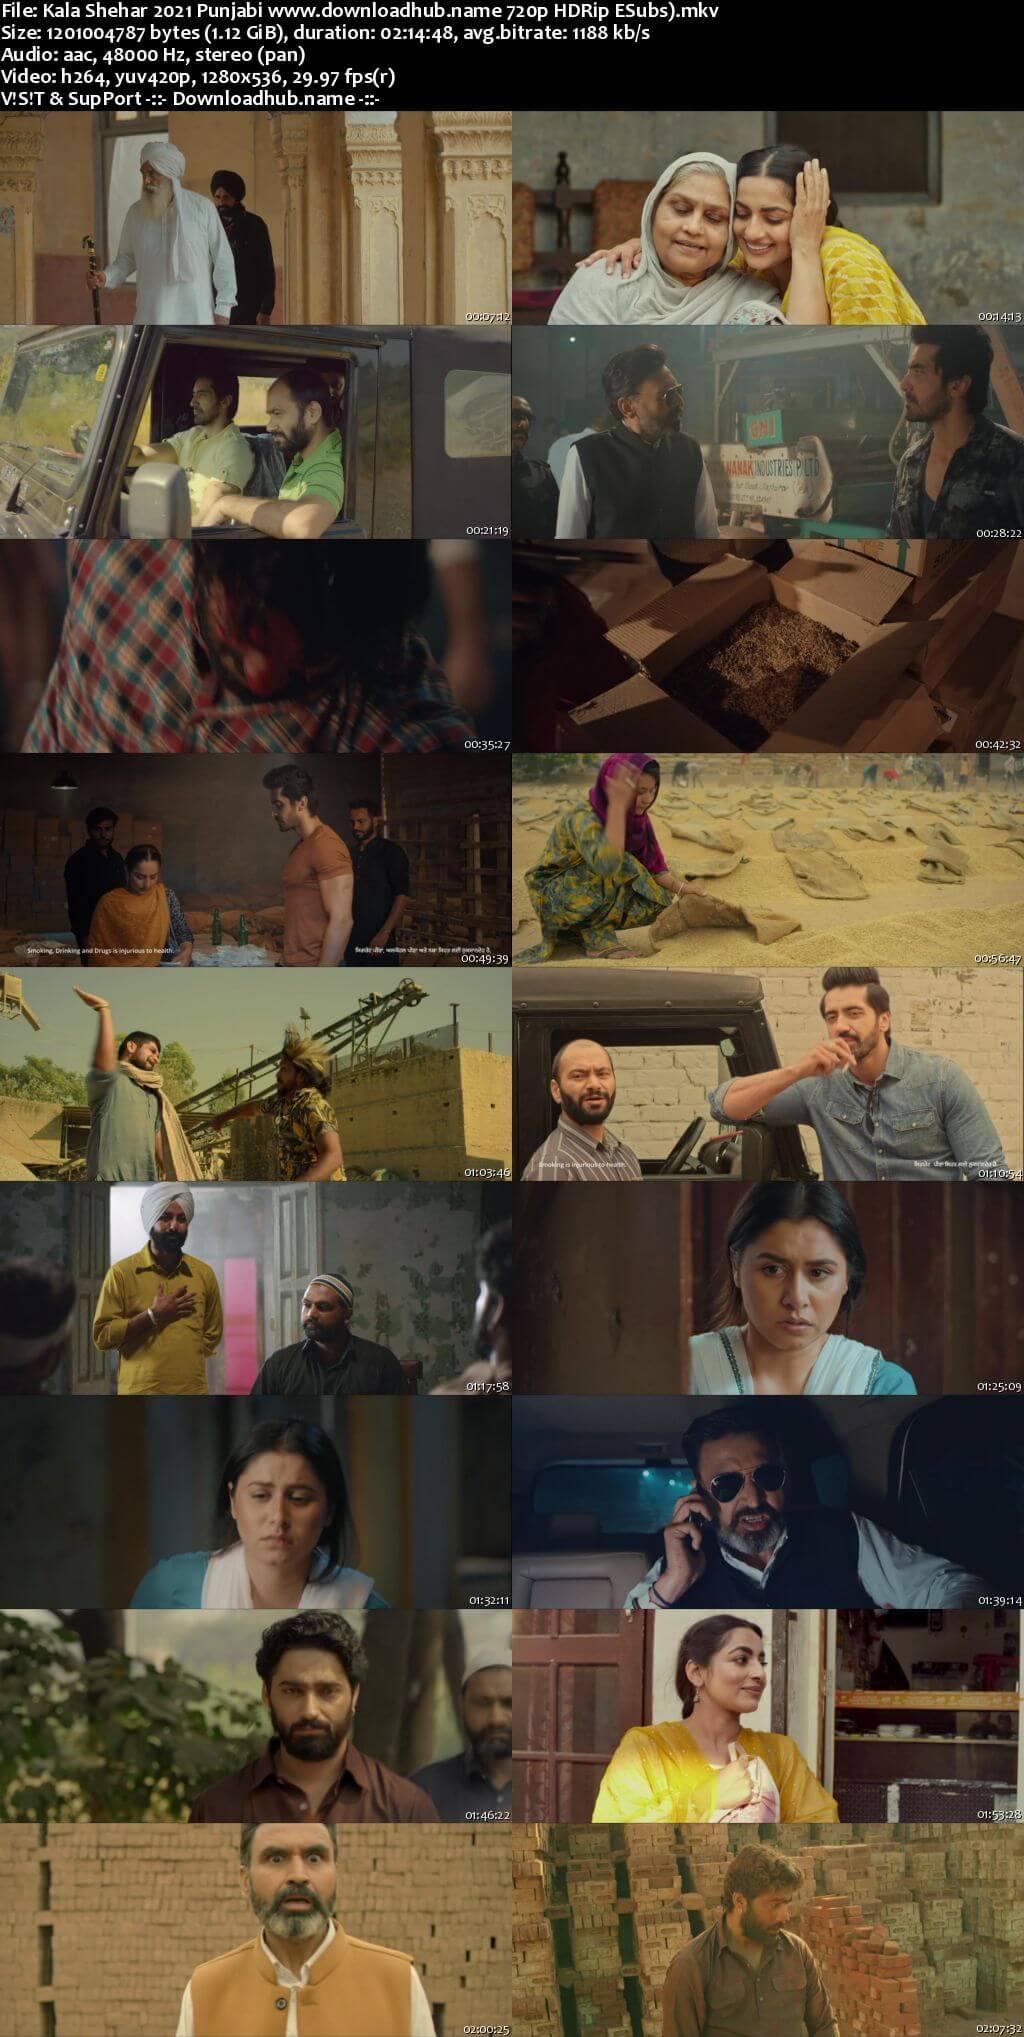 Kala Shehar 2021 Punjabi 720p HDRip ESubs